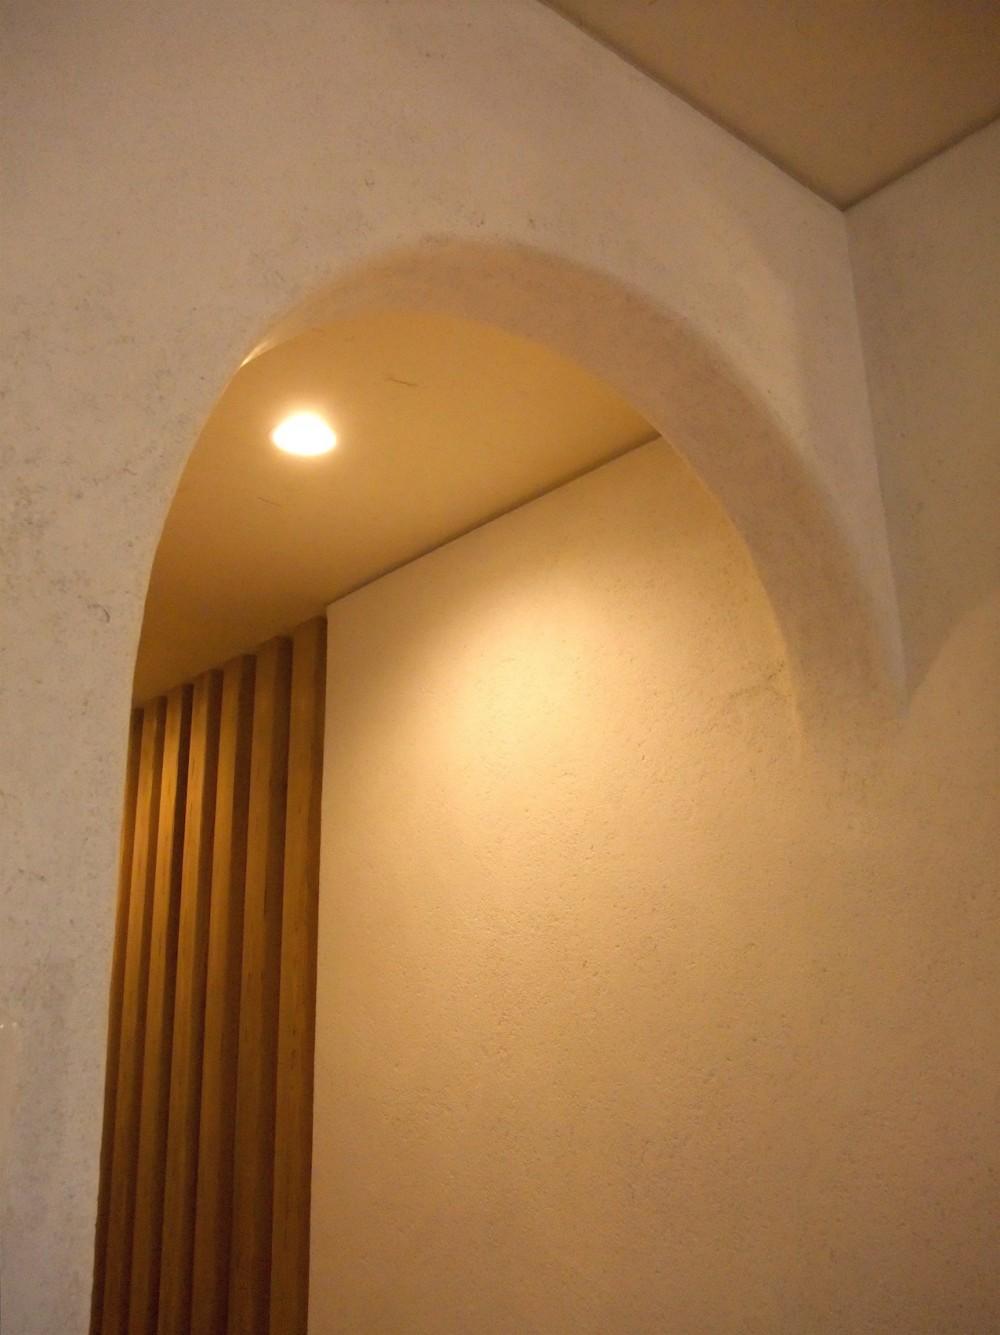 Edelweiss renovation 〜 ふたり暮らしのリノベーション 〜 (R壁)